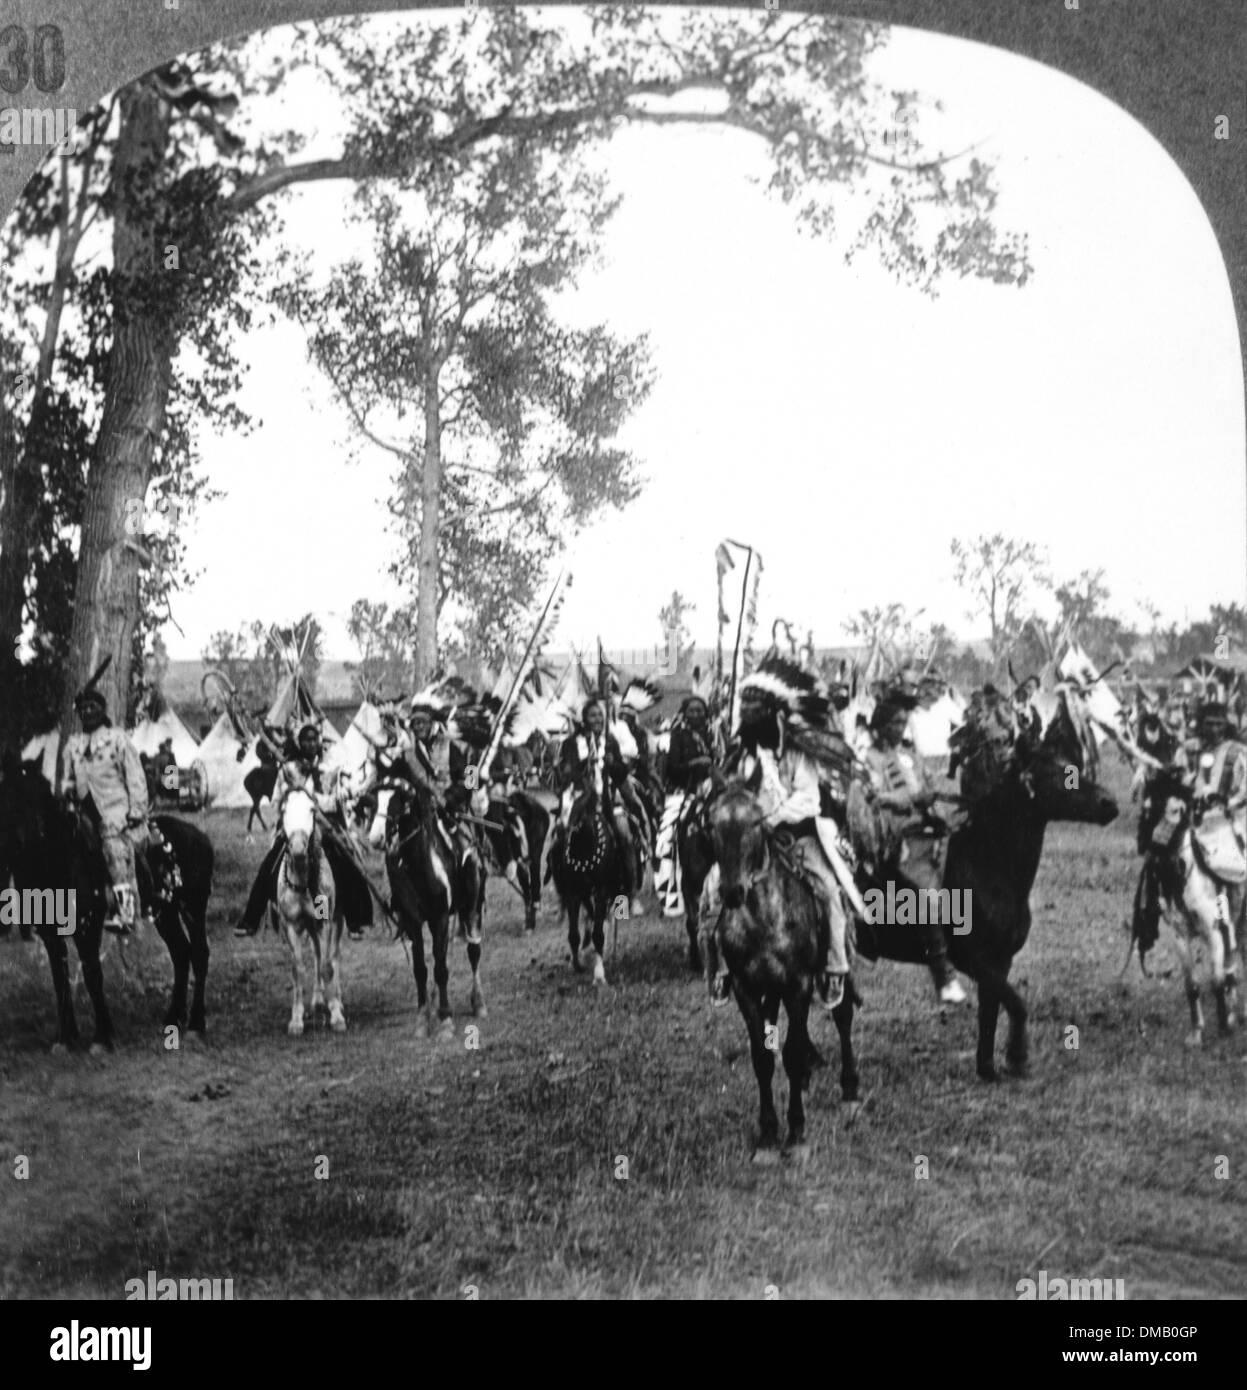 Sioux Native American Indians in Traditional Headdresses on Horseback, Nebraska, USA, 1900 - Stock Image